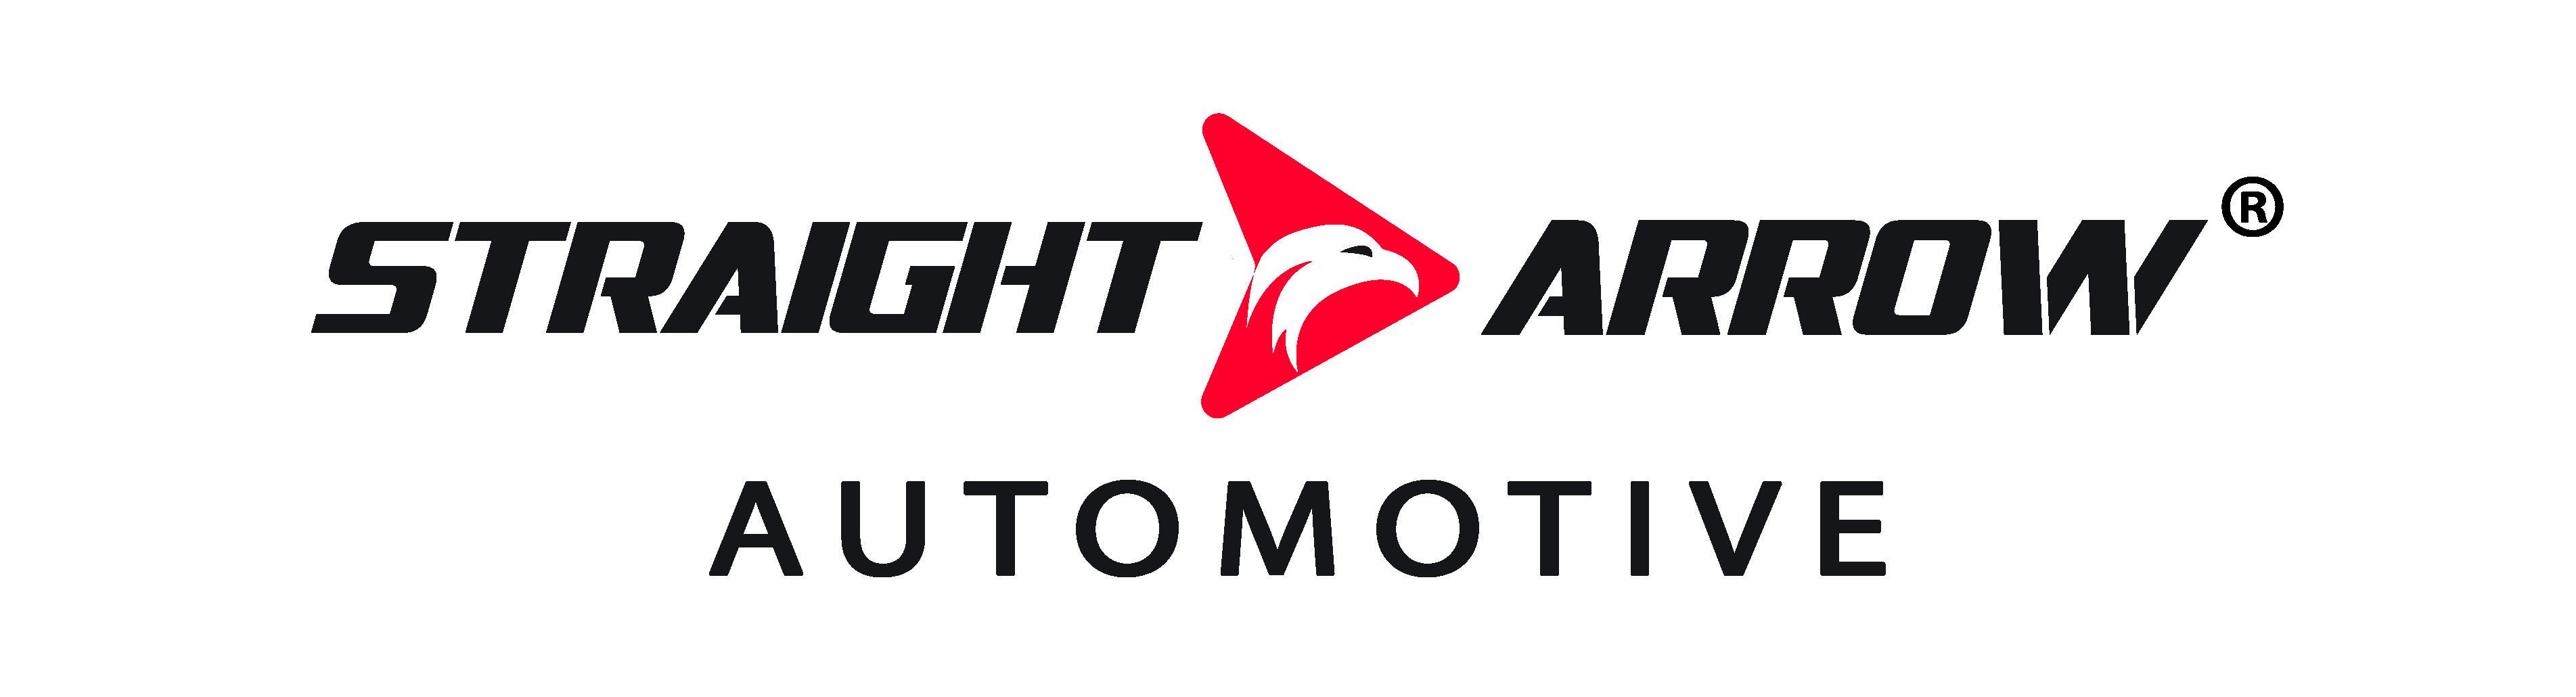 straitarrow-automotive-logo